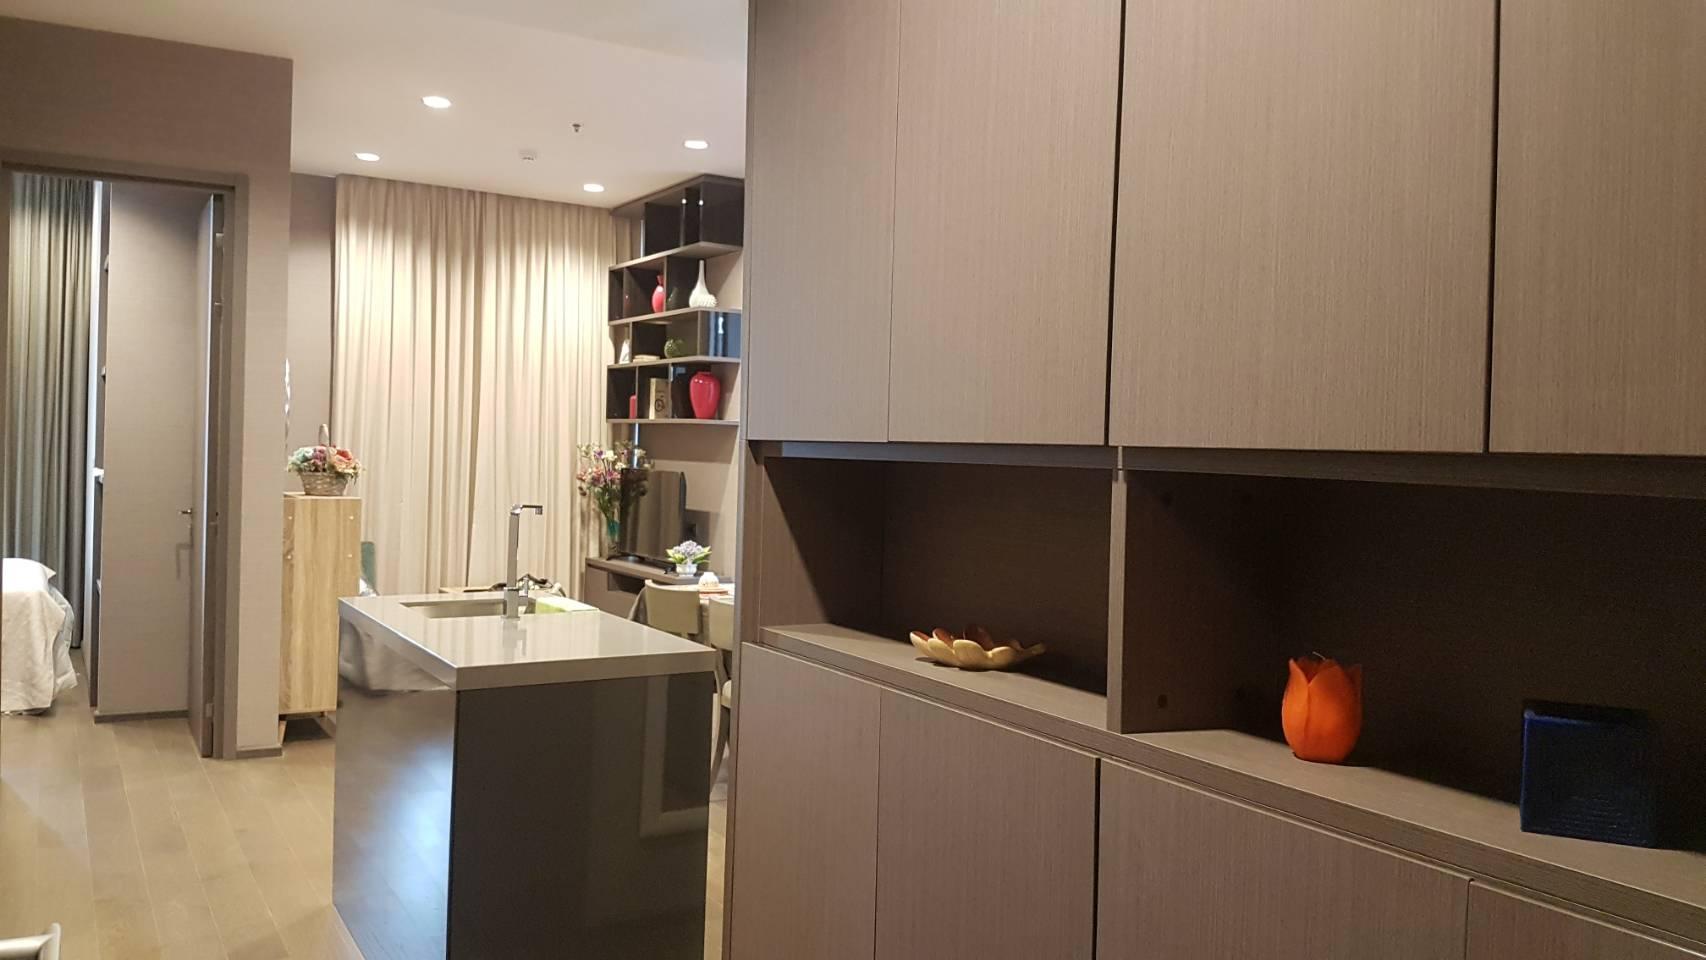 Bangkok Condo Apartment For Rent in Sathorn Chong Nonsi City View in Sathorn